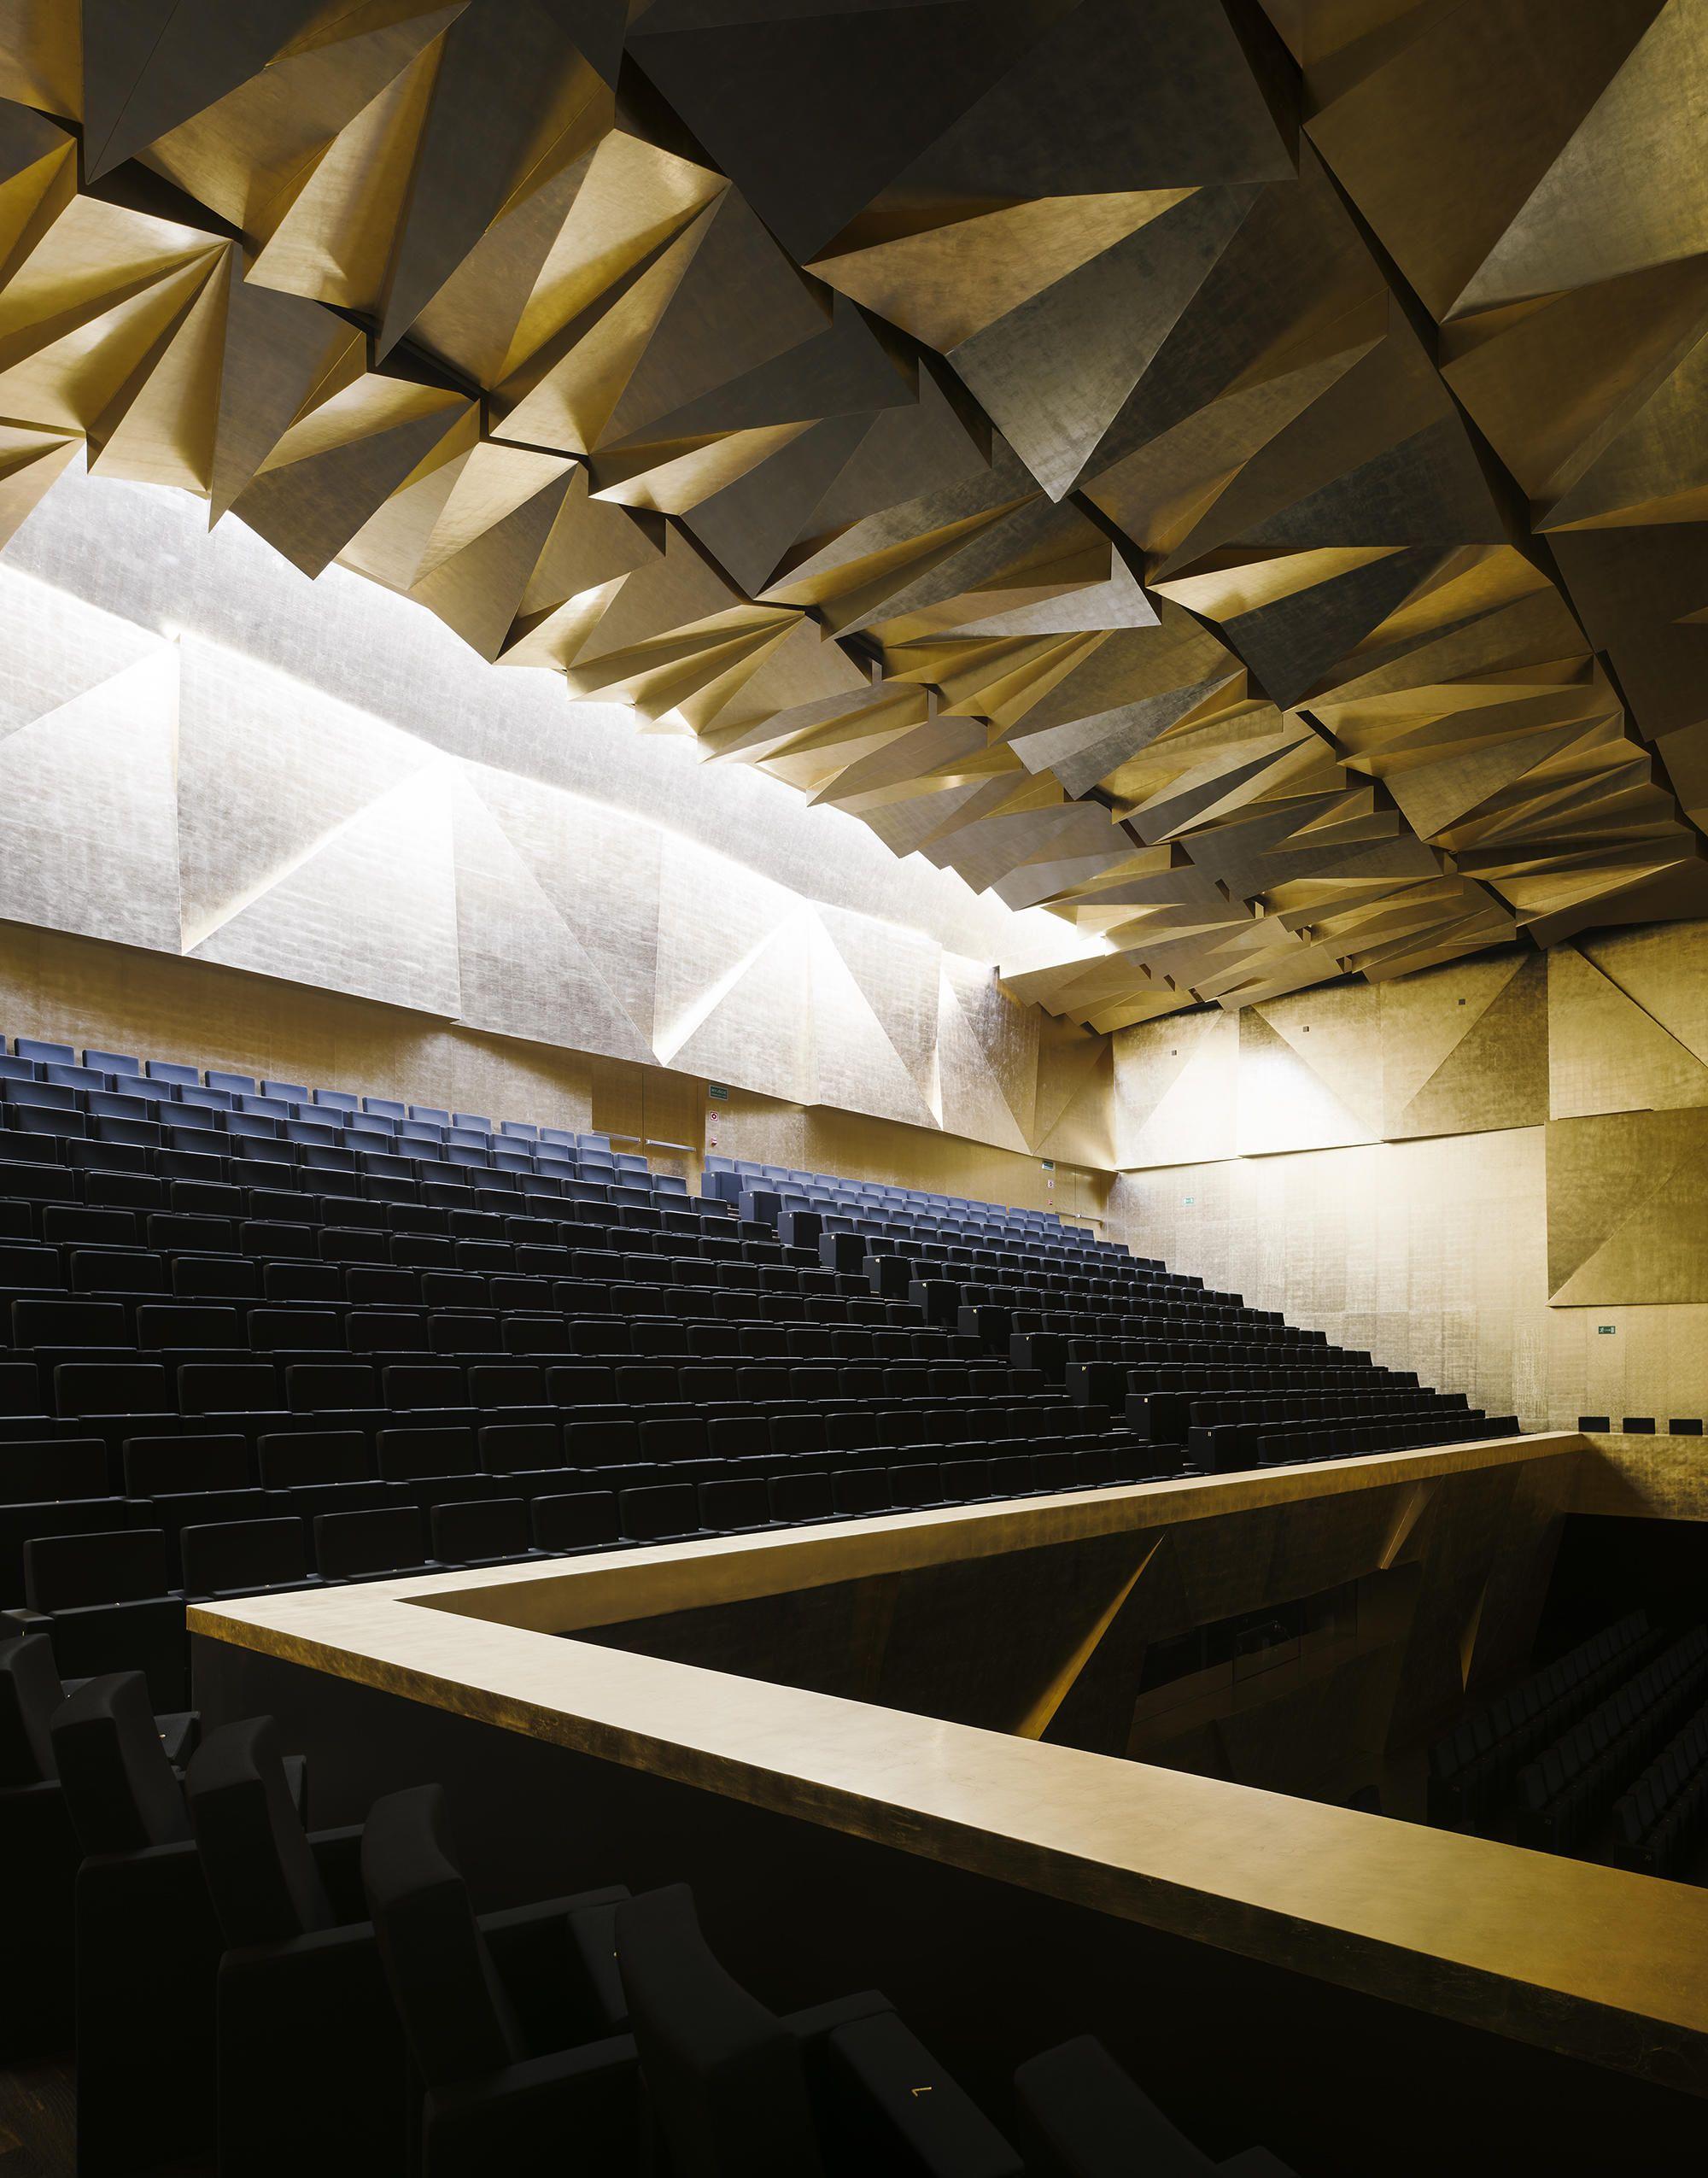 Philharmonic Hall In Szczecin By Barozzi Veiga Concert Halls In 2020 Concert Hall Theatre Interior Szczecin